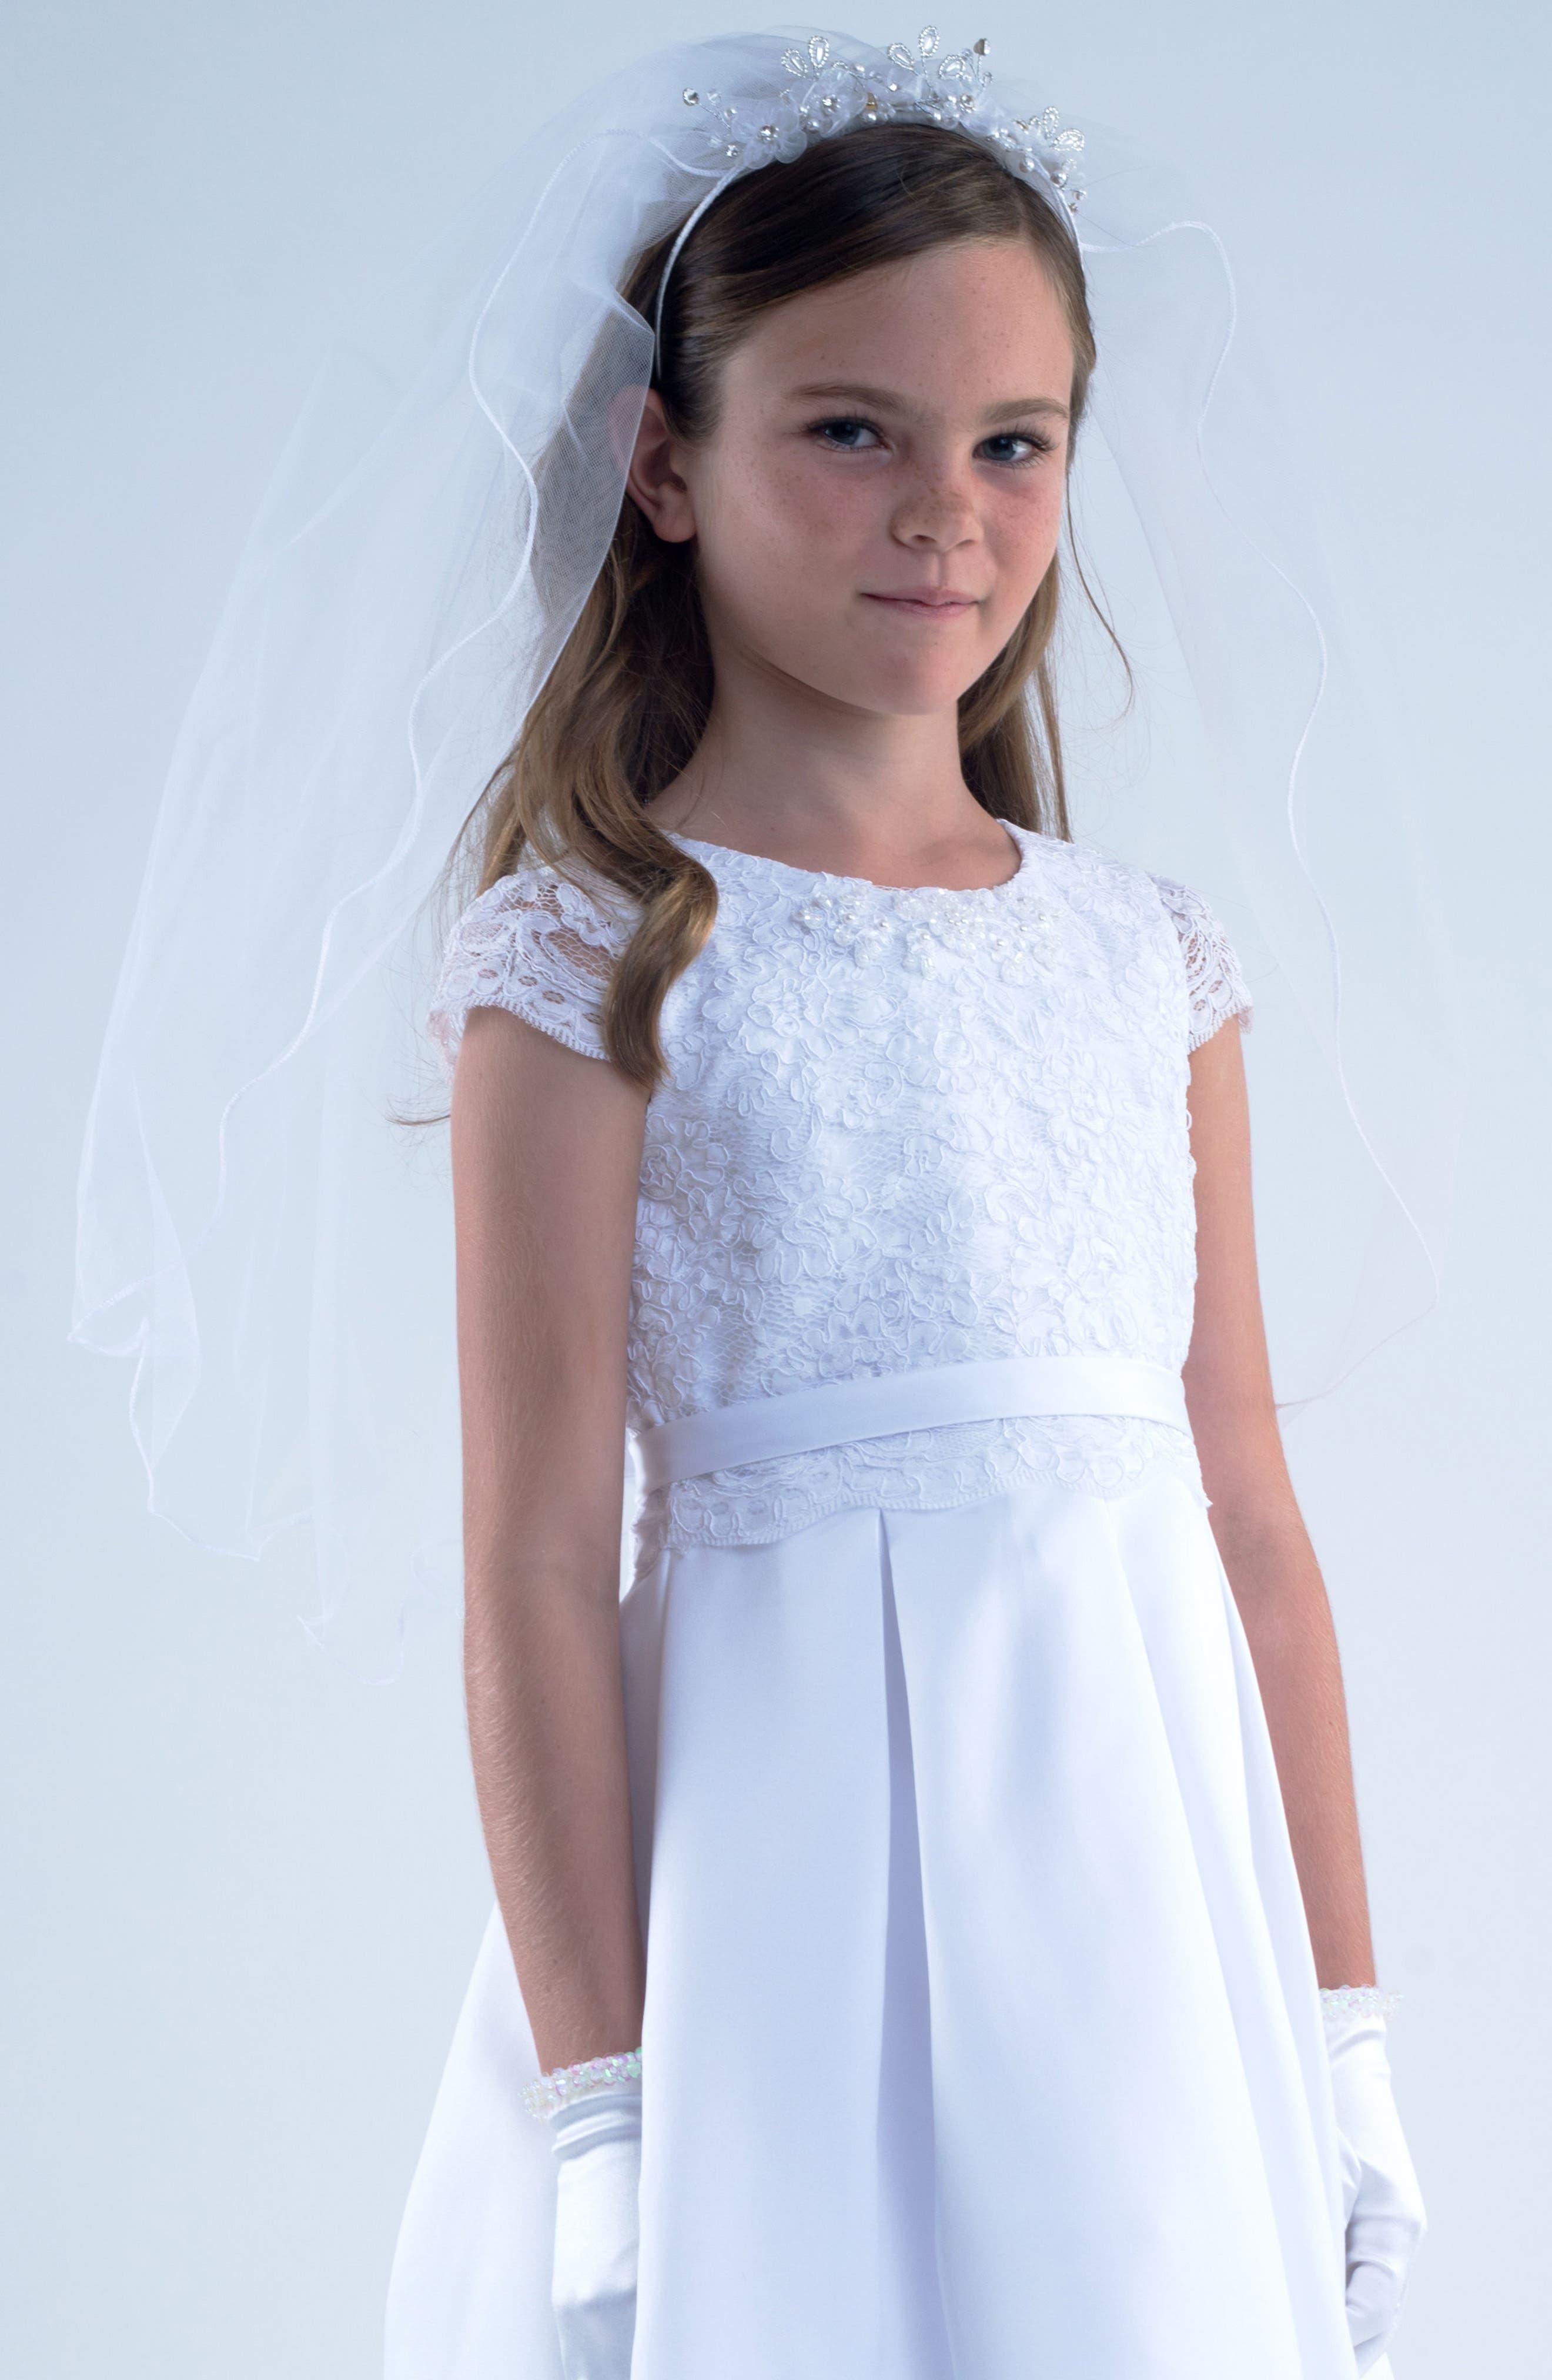 Alternate Image 1 Selected - Us Angels Tiara with Veil